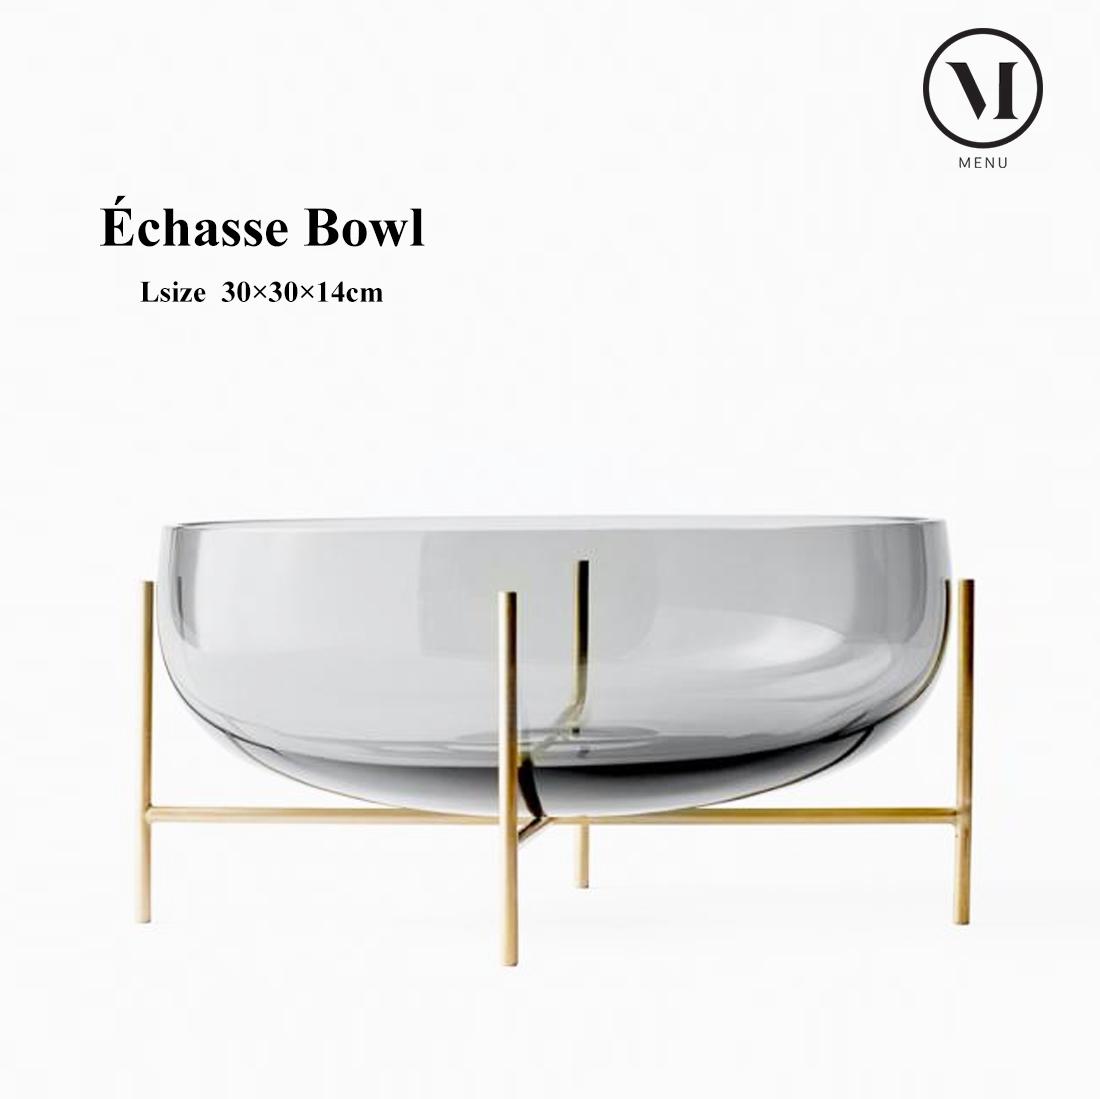 【menu】Echasse Bowl L スモーク 4798949 イシャスベース メニュー 30×30×14cm/北欧/インテリア/プレゼント